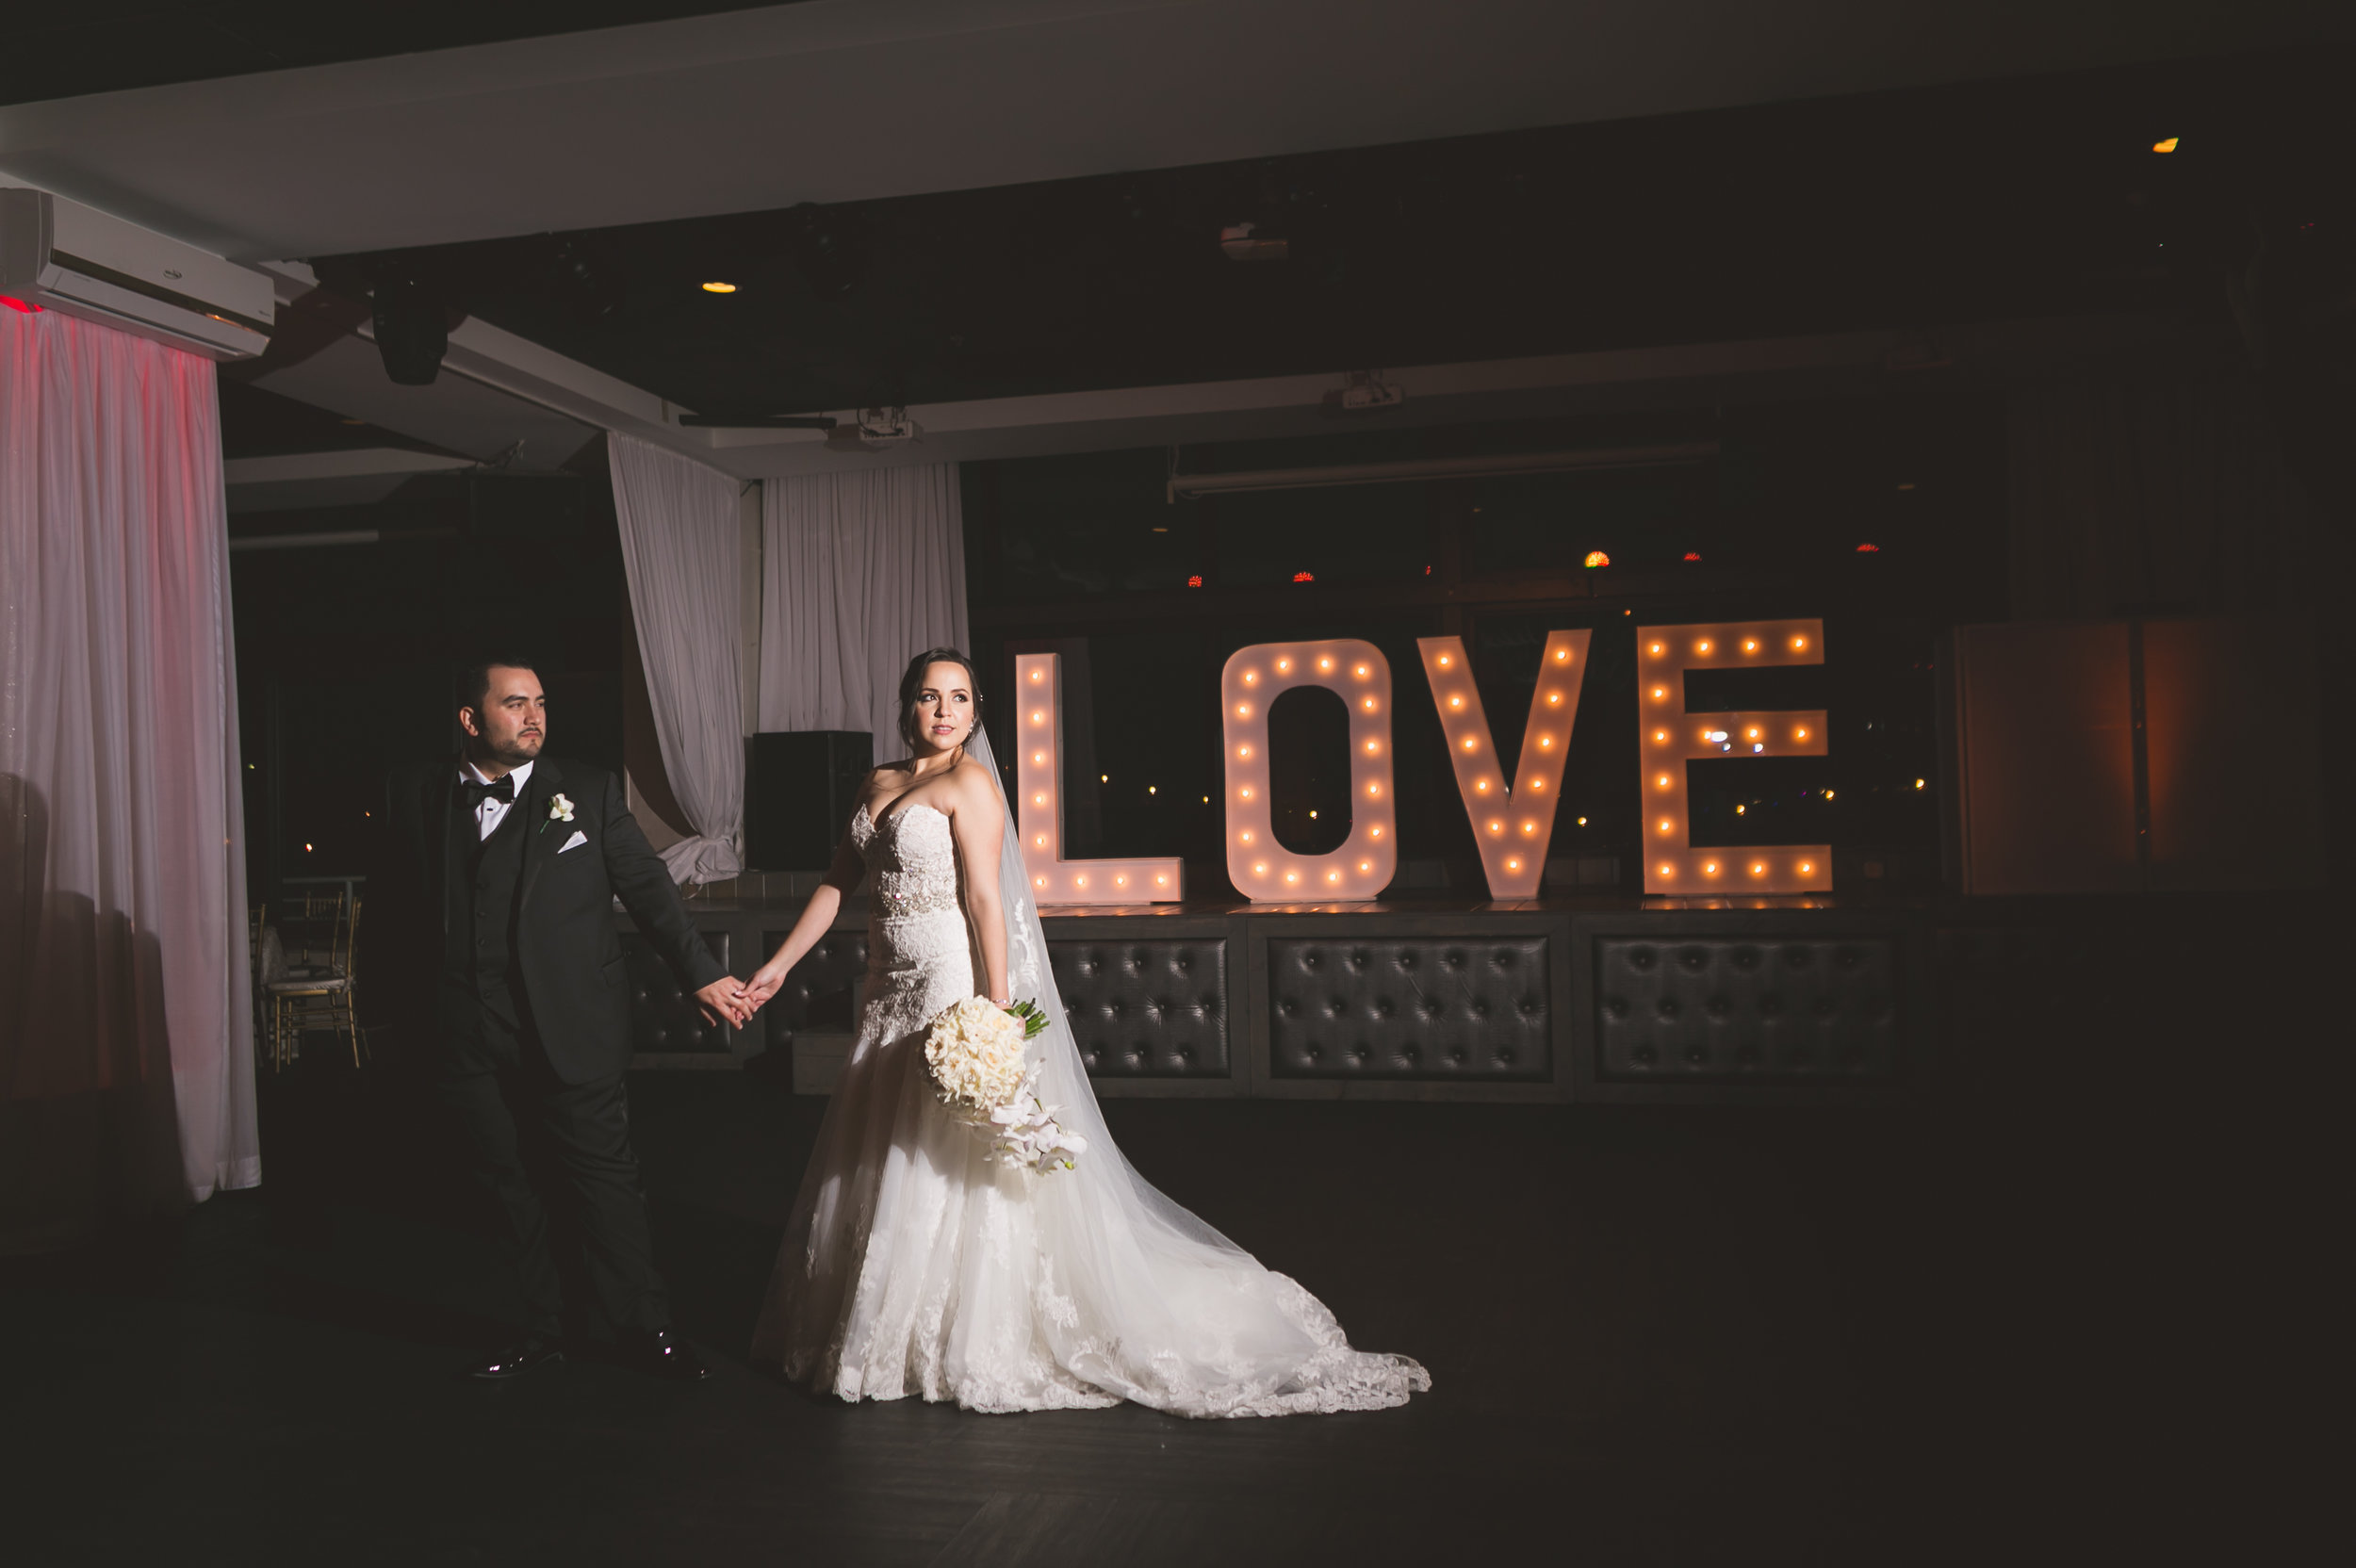 Miami Wedding Photographer | Dipp Photography